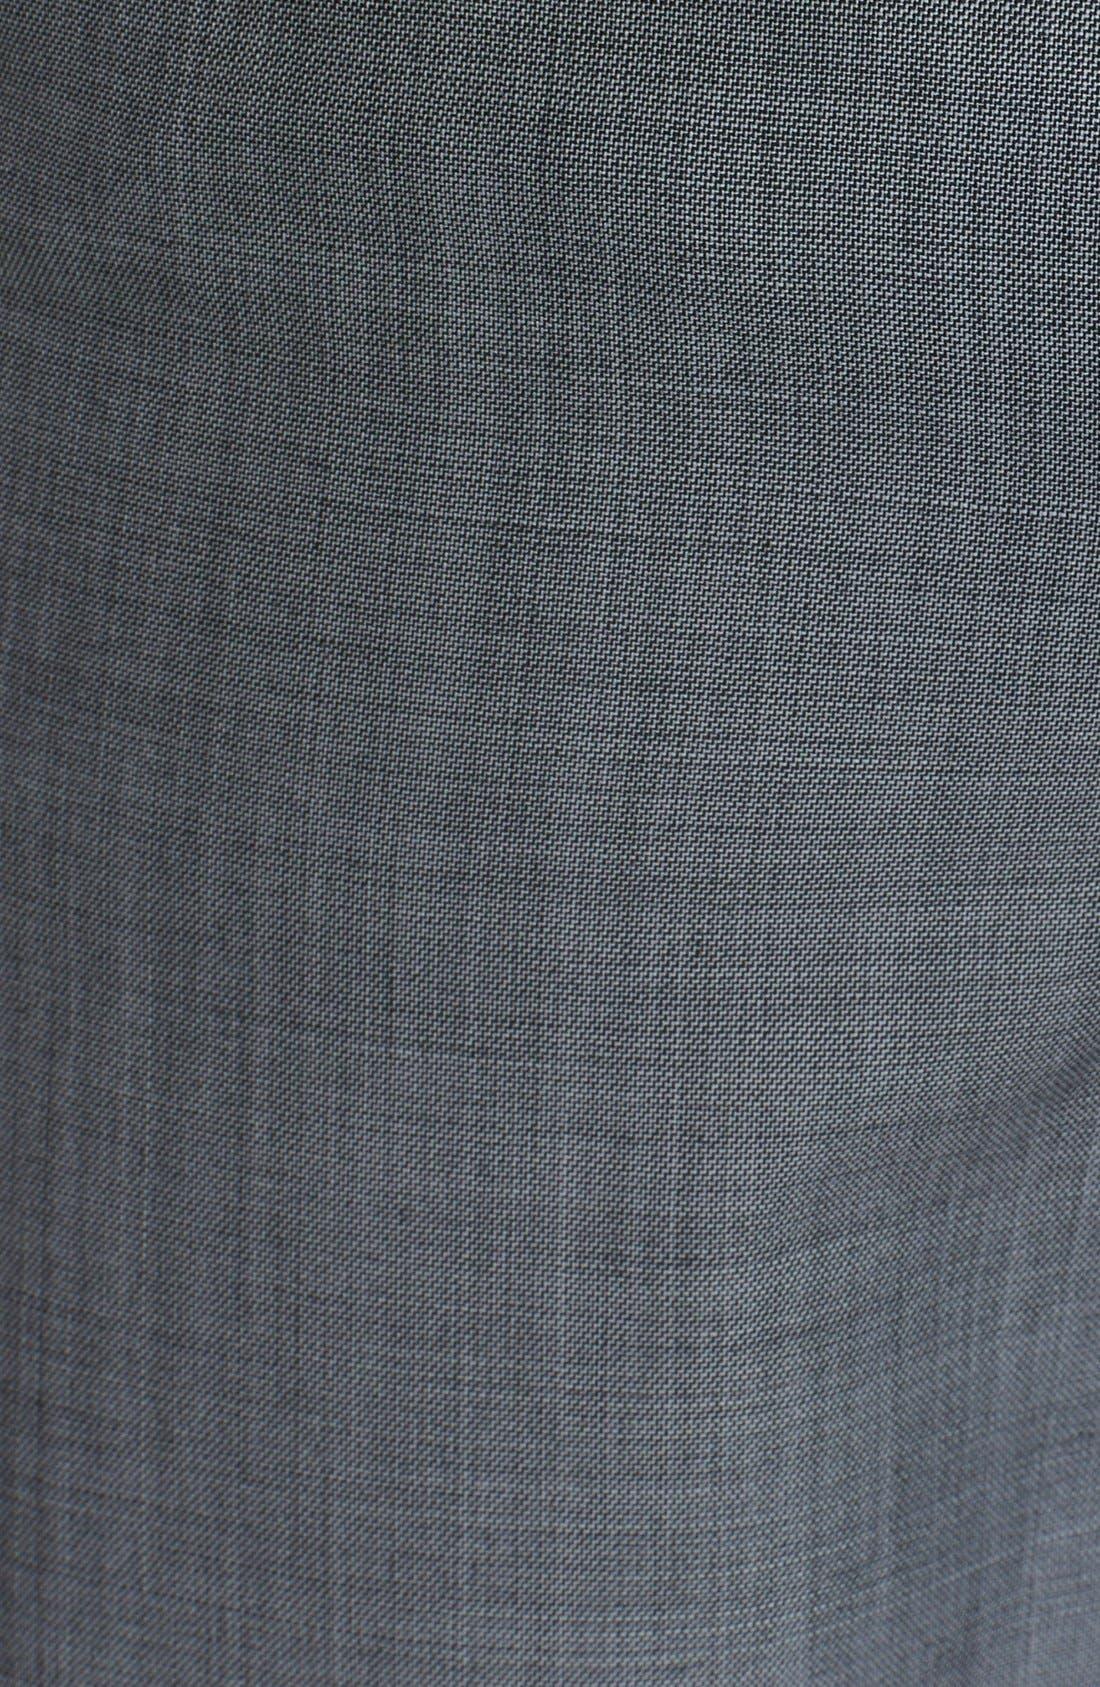 Alternate Image 3  - Alexander Wang Layered Wool Shorts